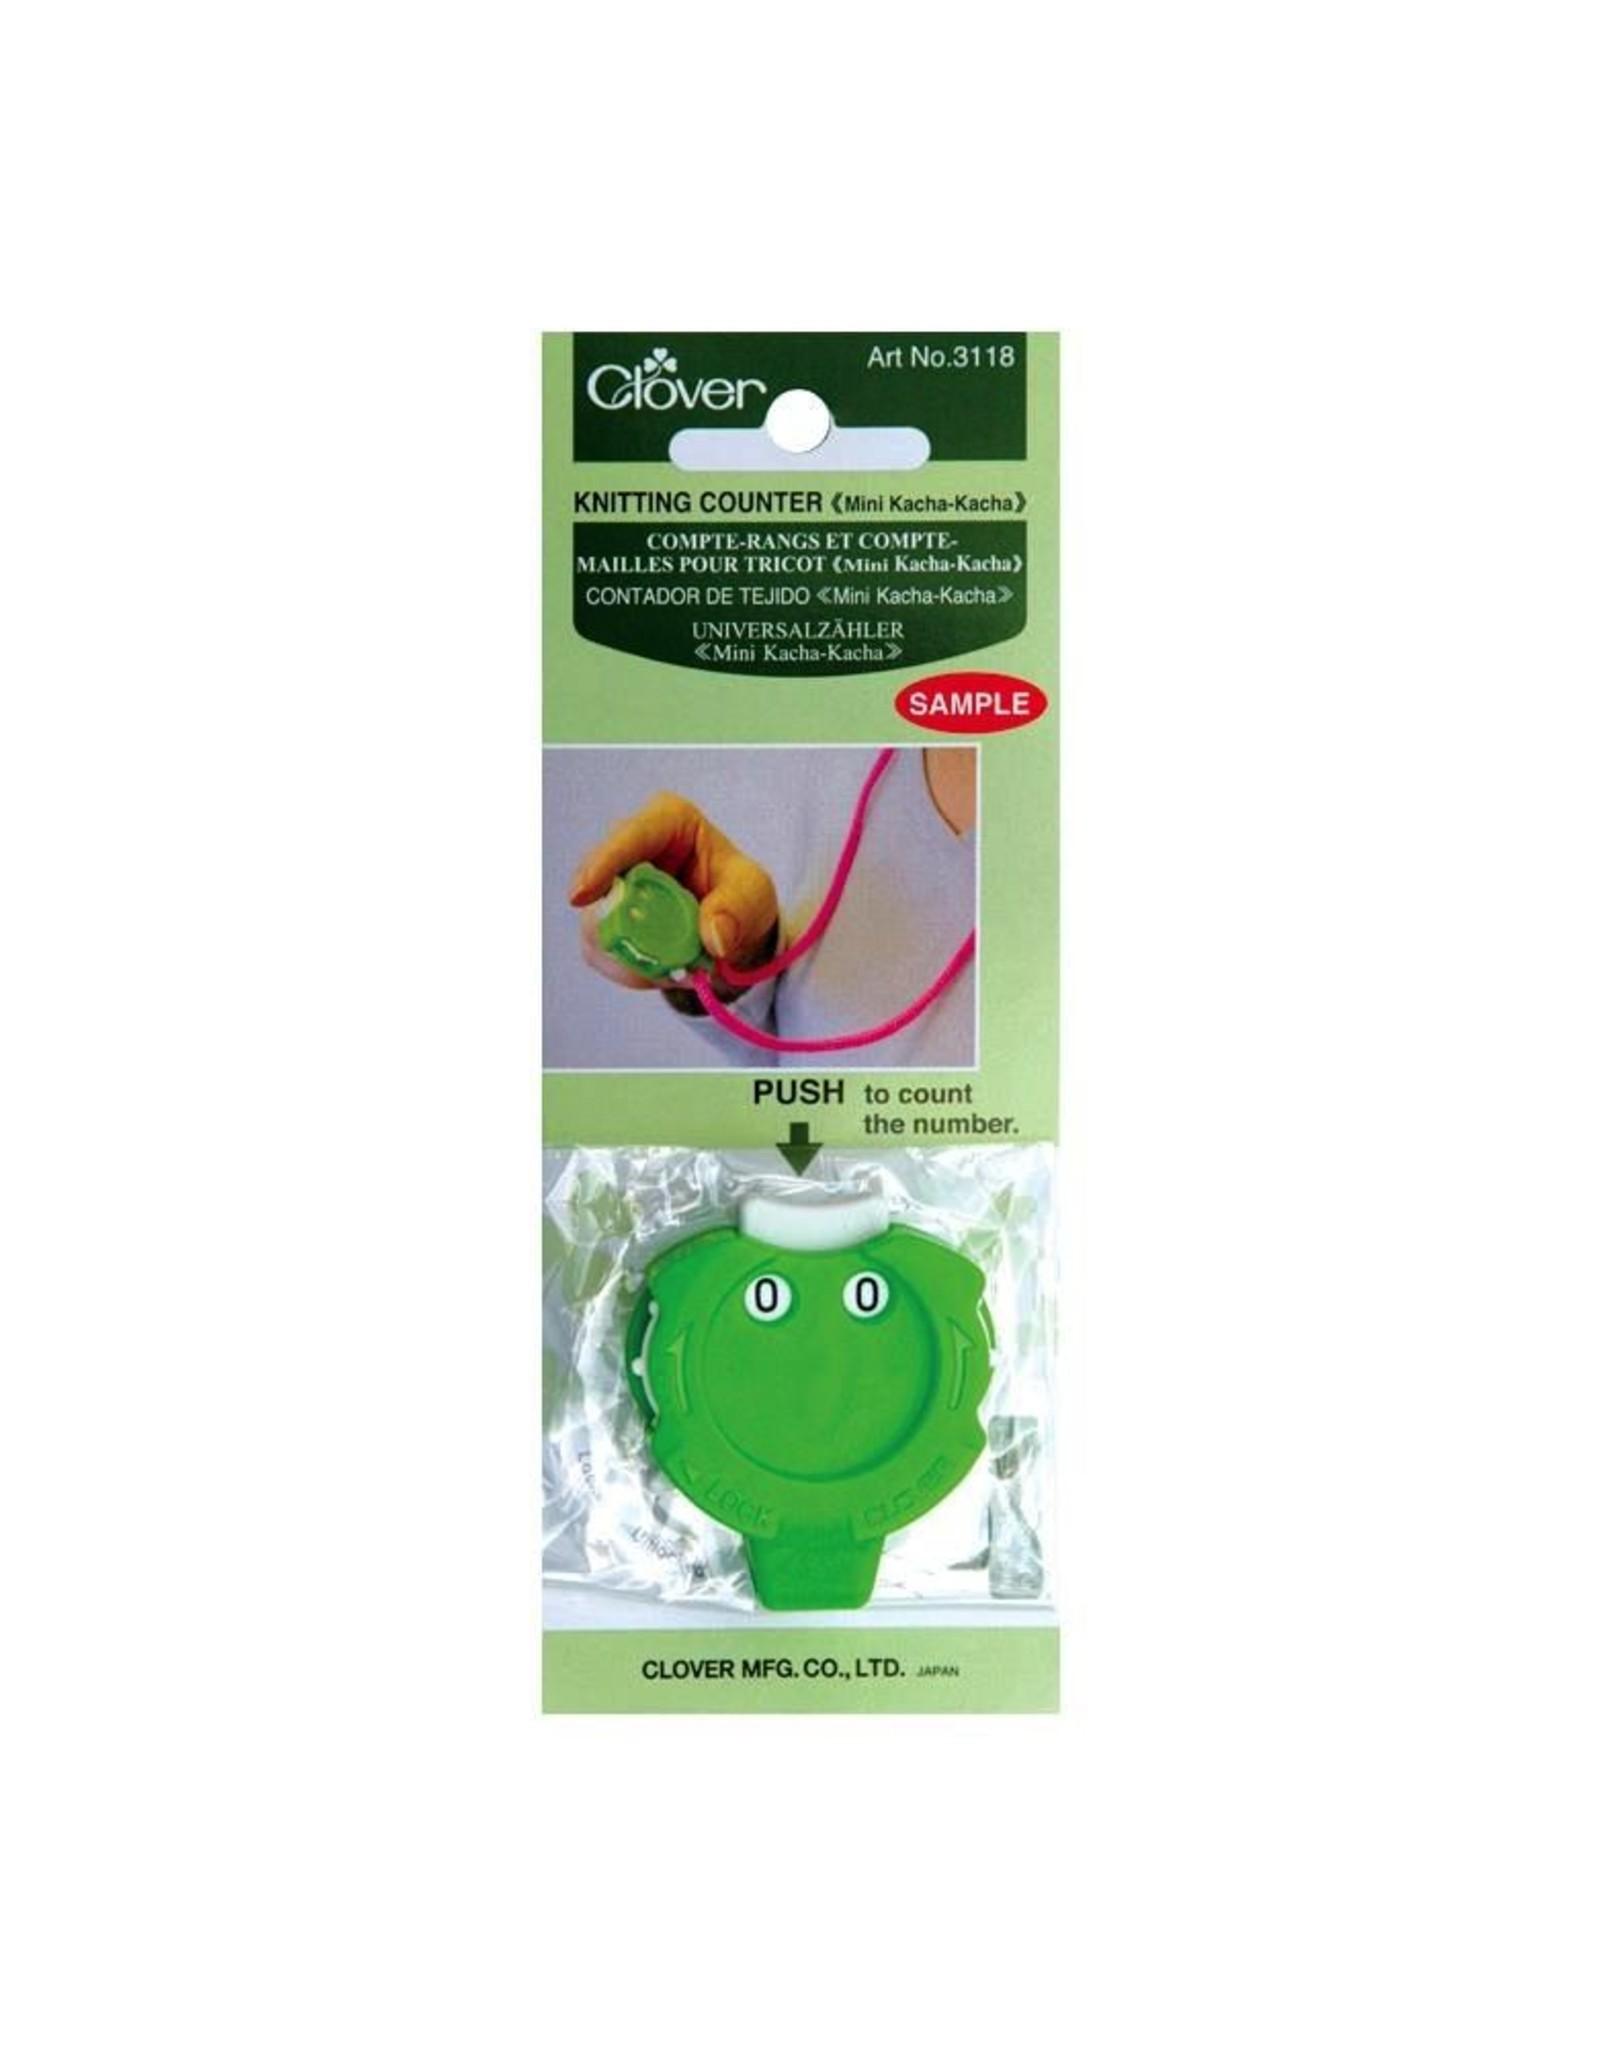 Clover Mini Kacha-Kacha Knitting Counter